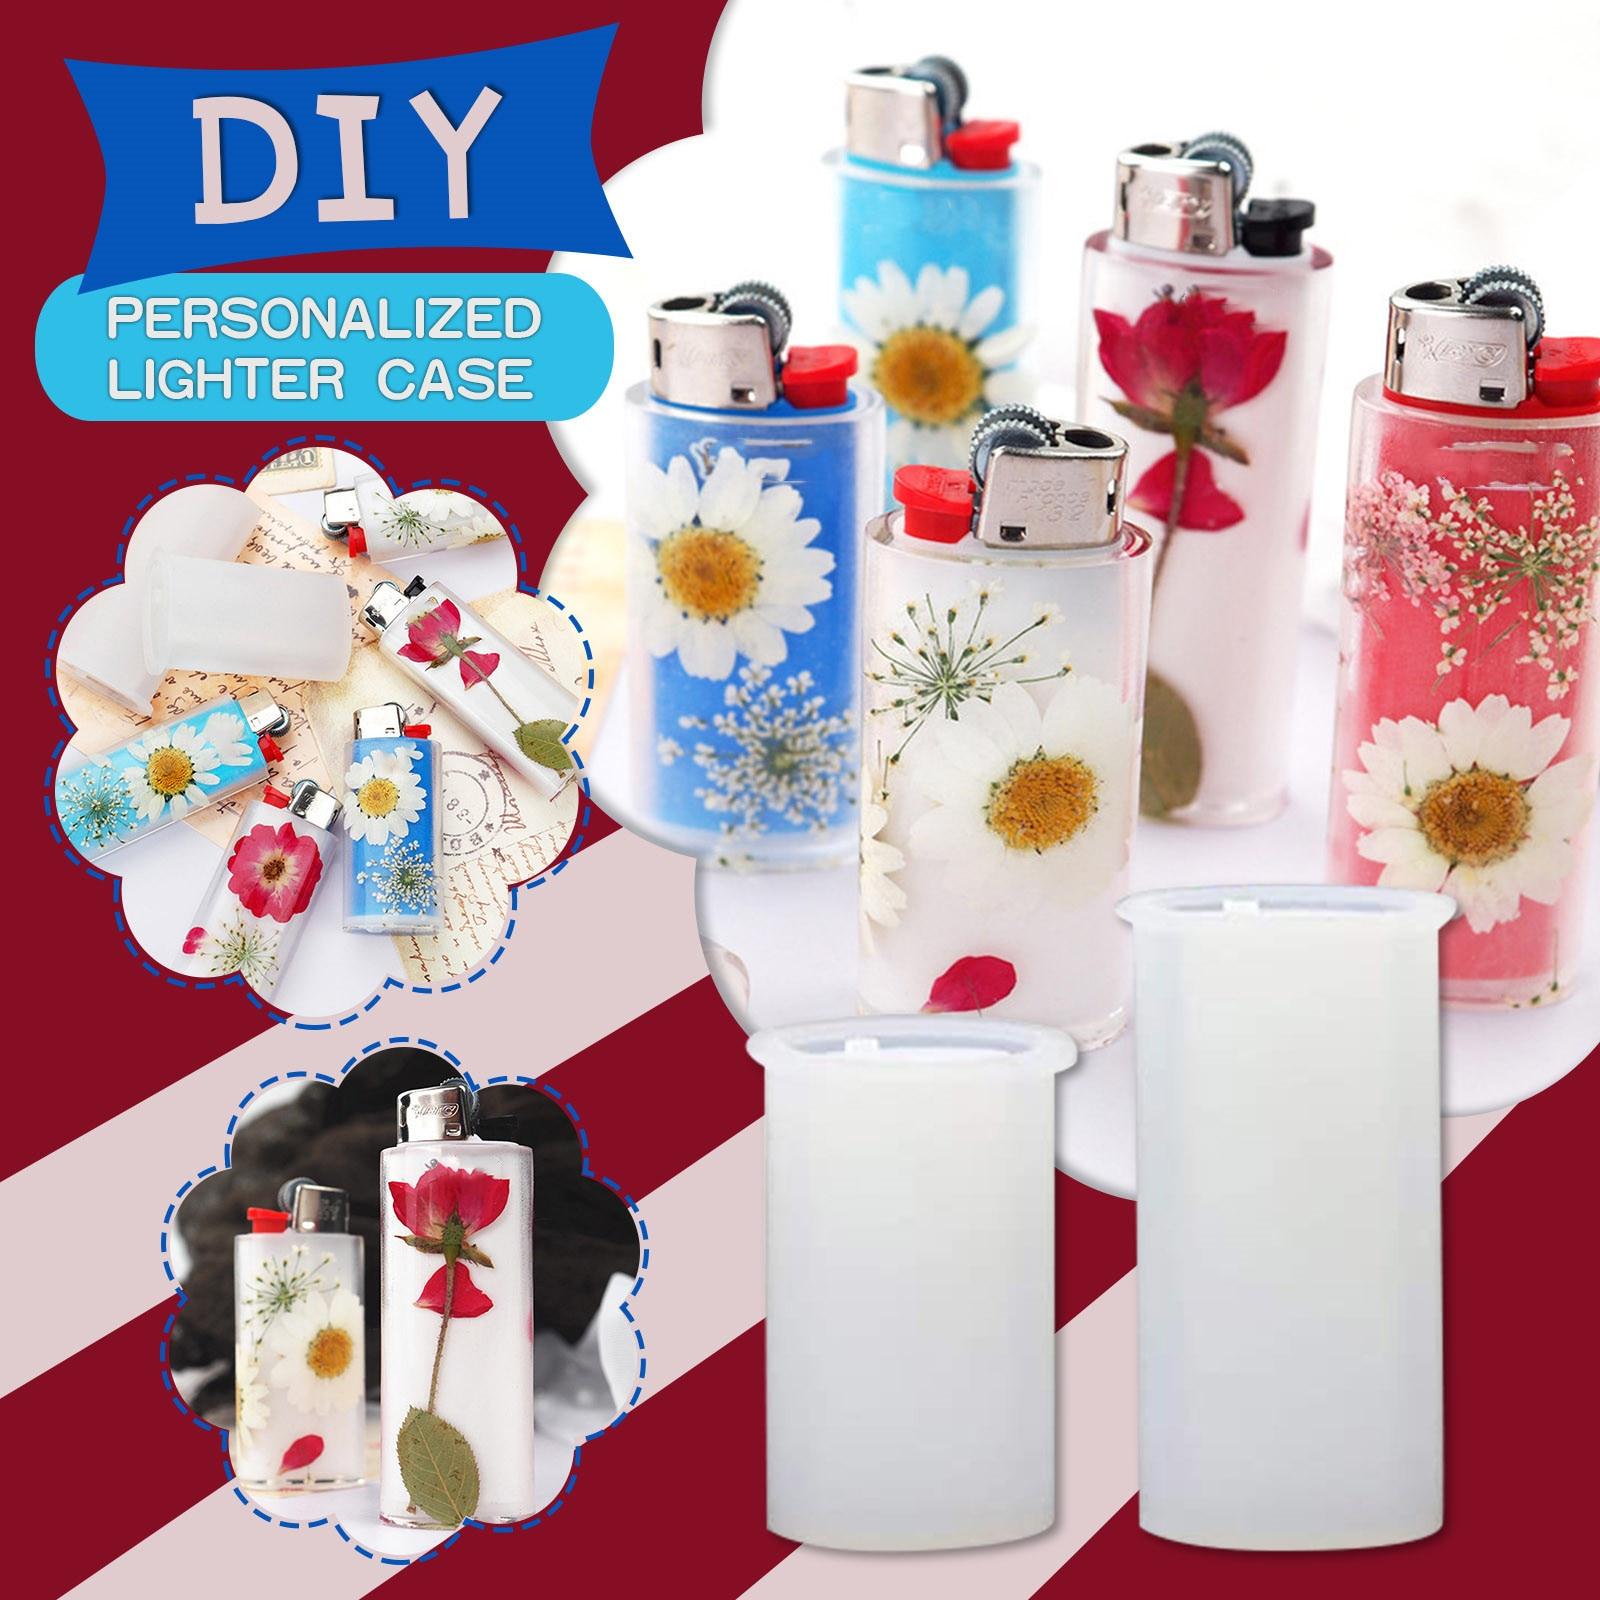 2pcs Lighter Case Silicone Molds Handmade Boyfriend Gift Diy Craft Cigarette Lighter Protective Cover Resin Mold